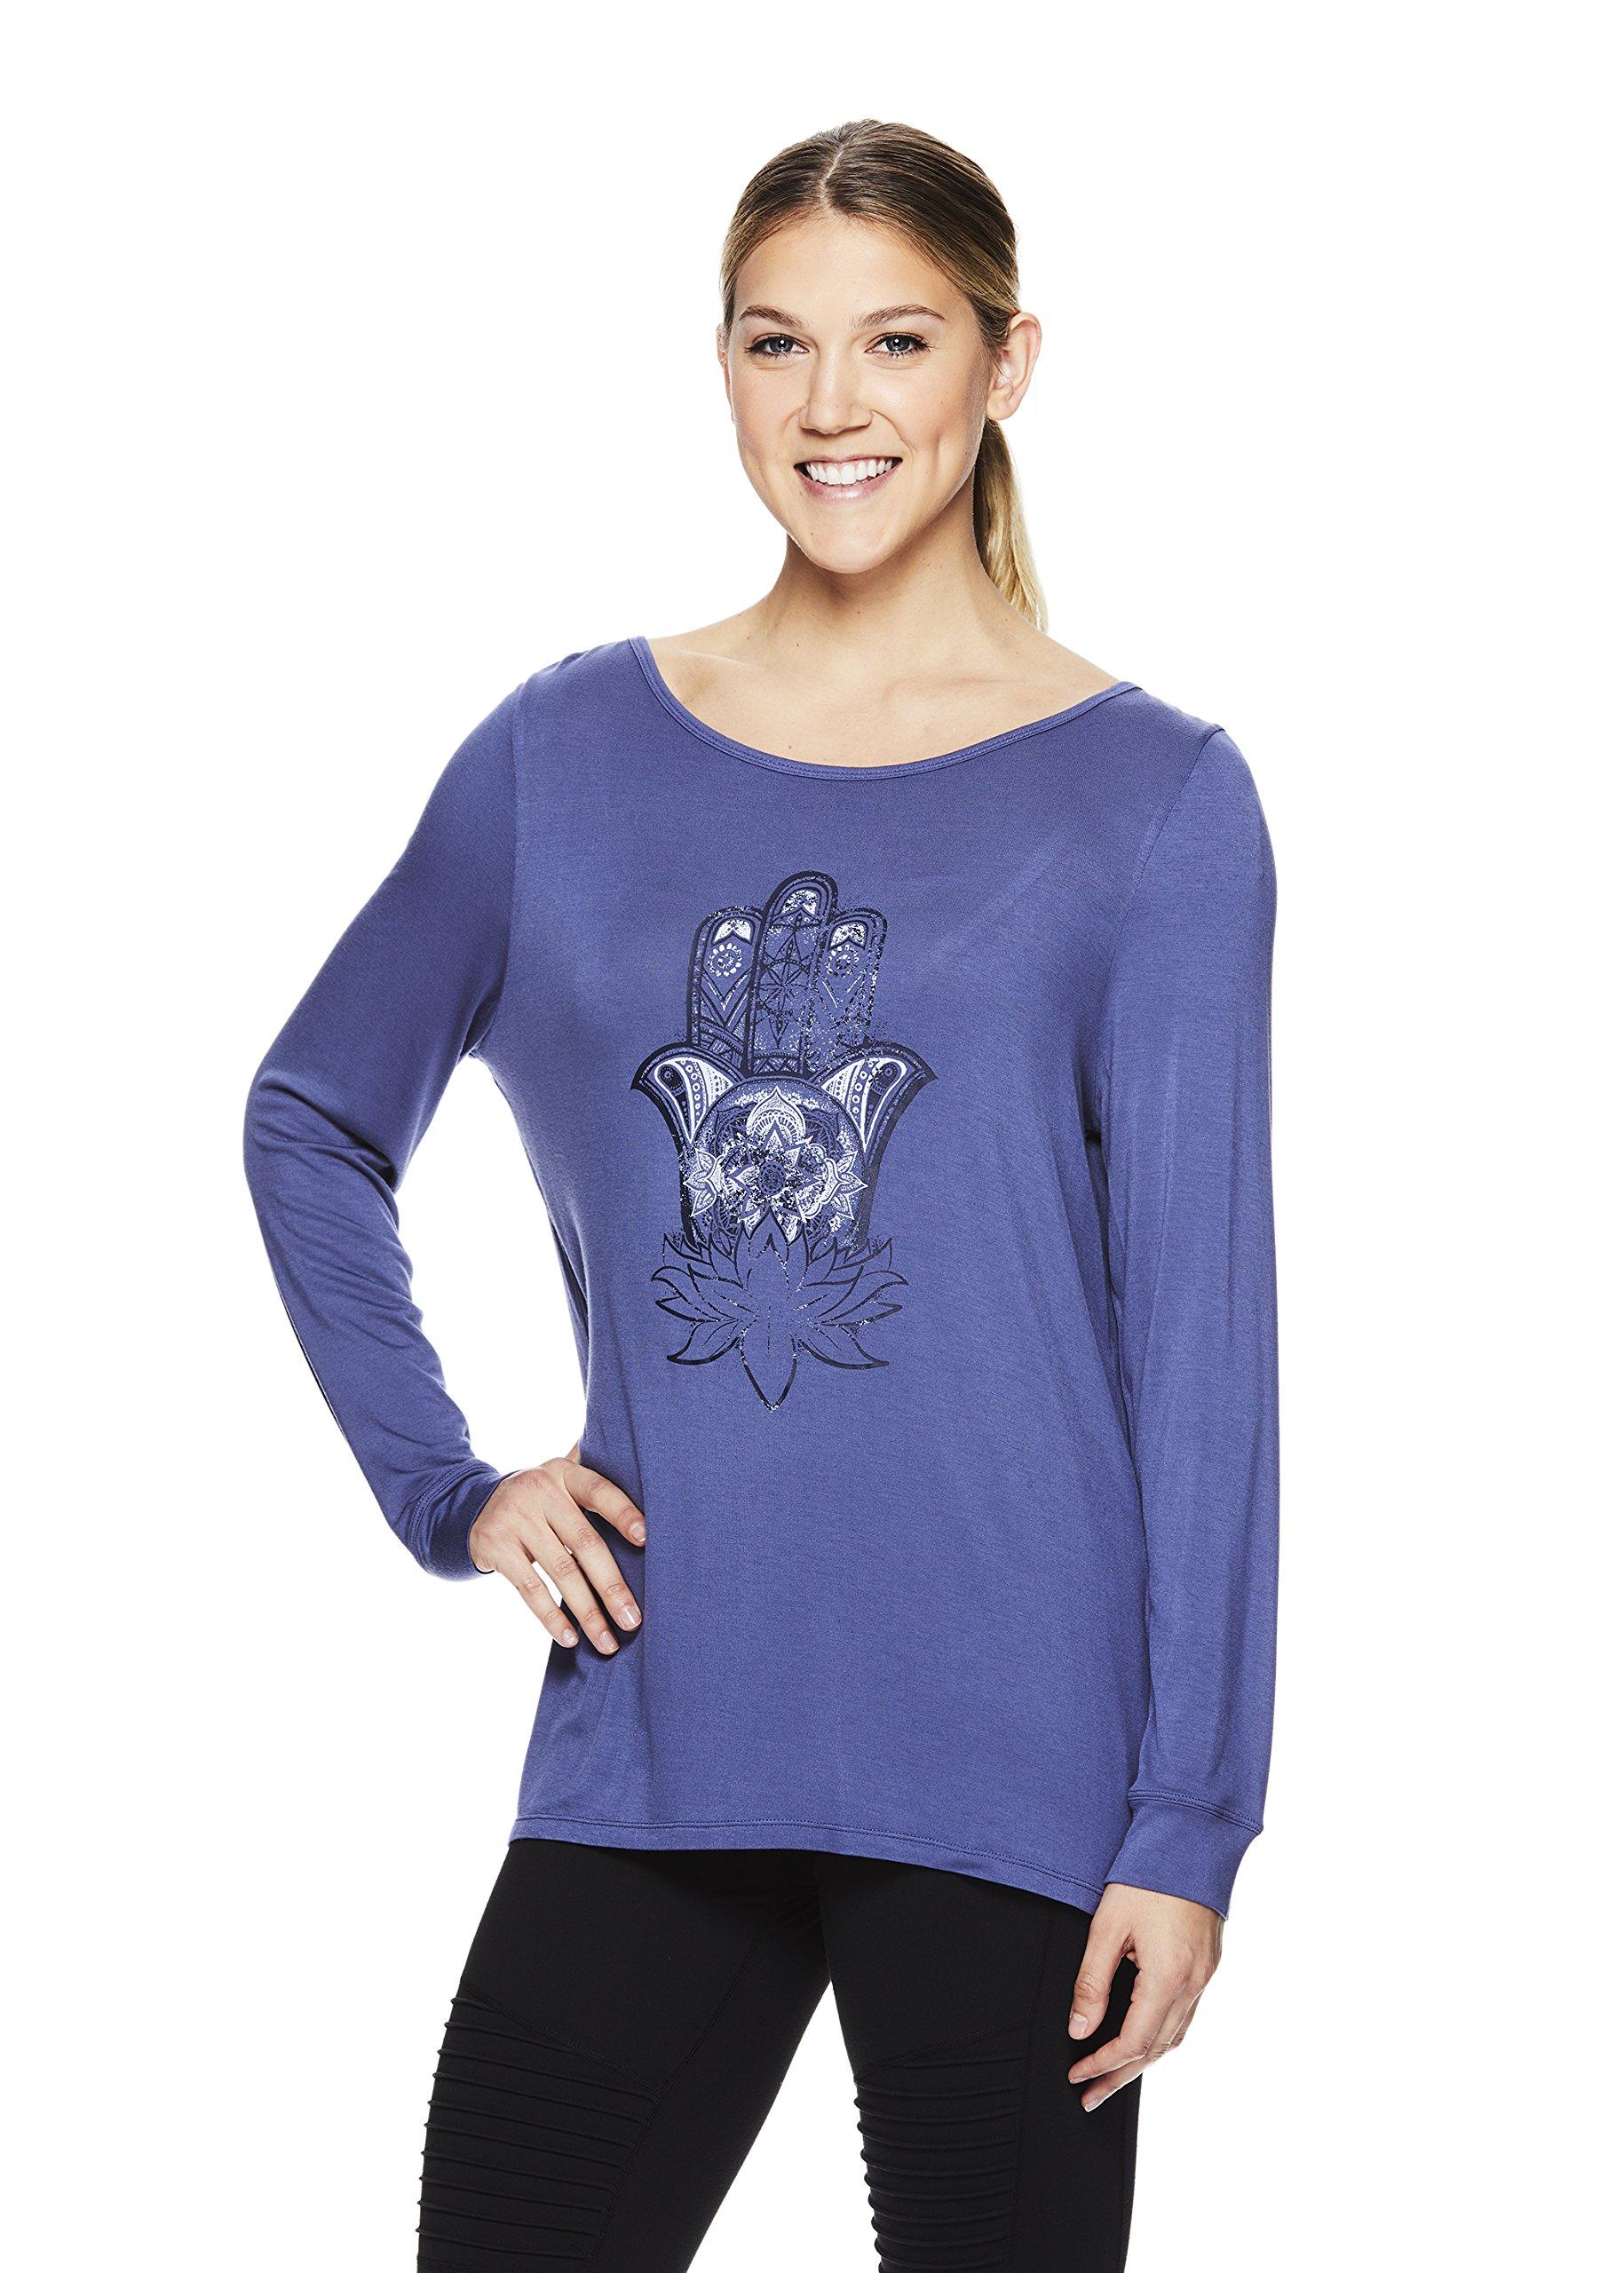 Gaiam Women's Long Sleeve Graphic Yoga T Shirt - Activewear Top w/Open Back - Hailey Blue Indigo, X-Large by Gaiam